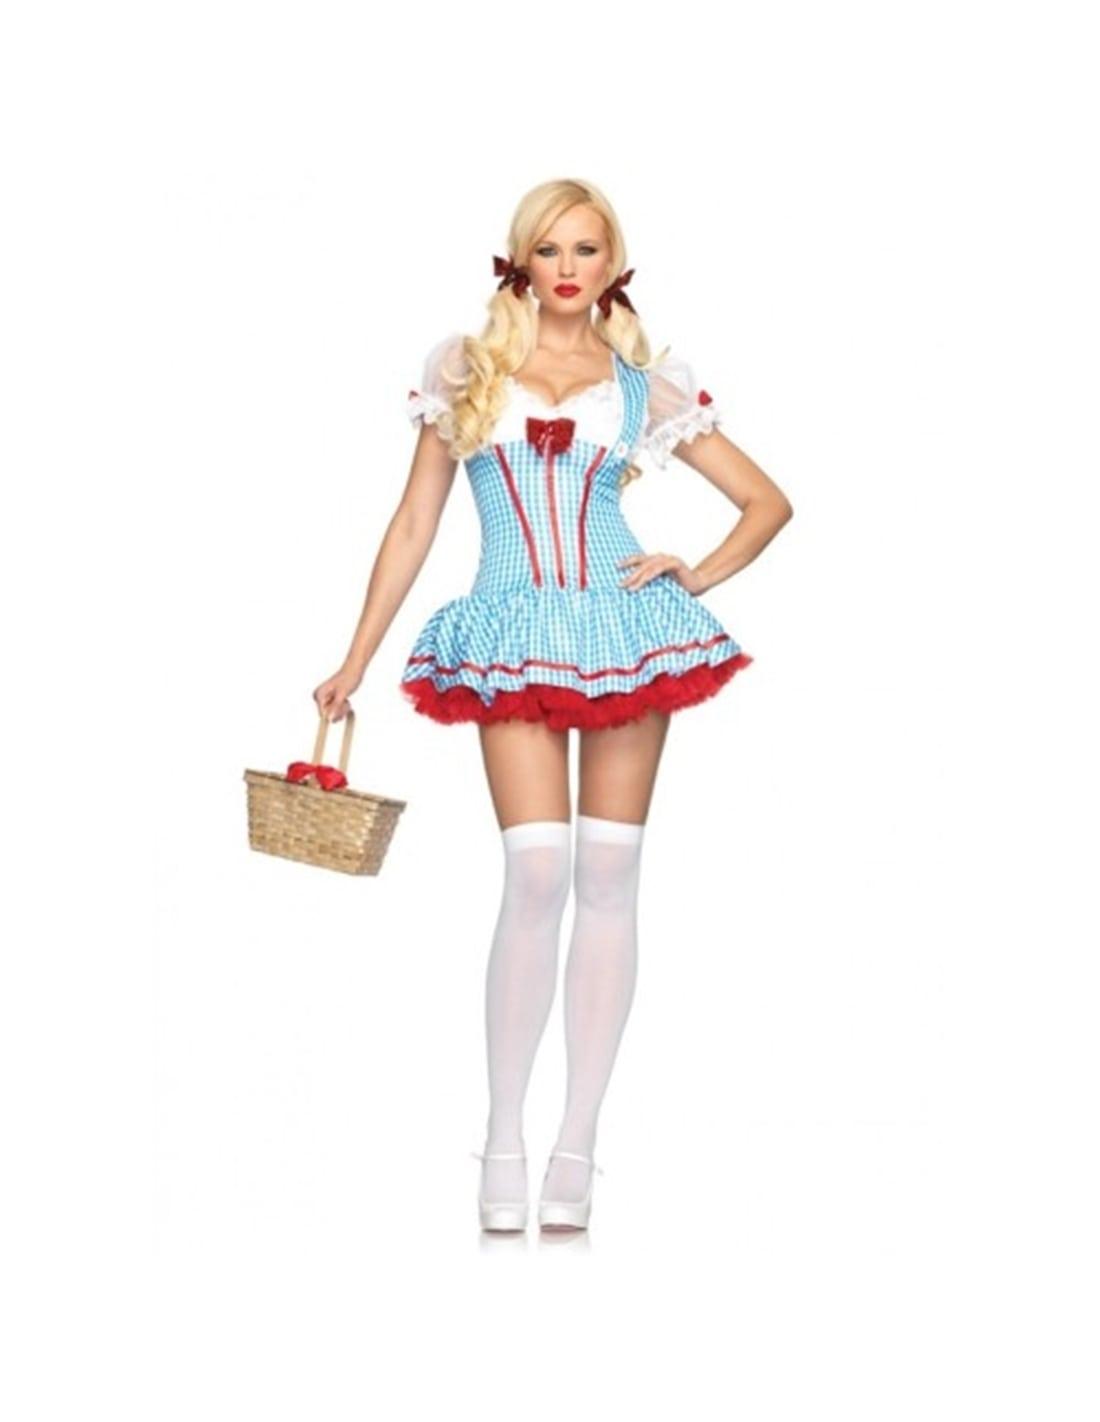 PR2010324110 - Fantasia De Diva Dorothy - 36-38 S/M-PR2010324110